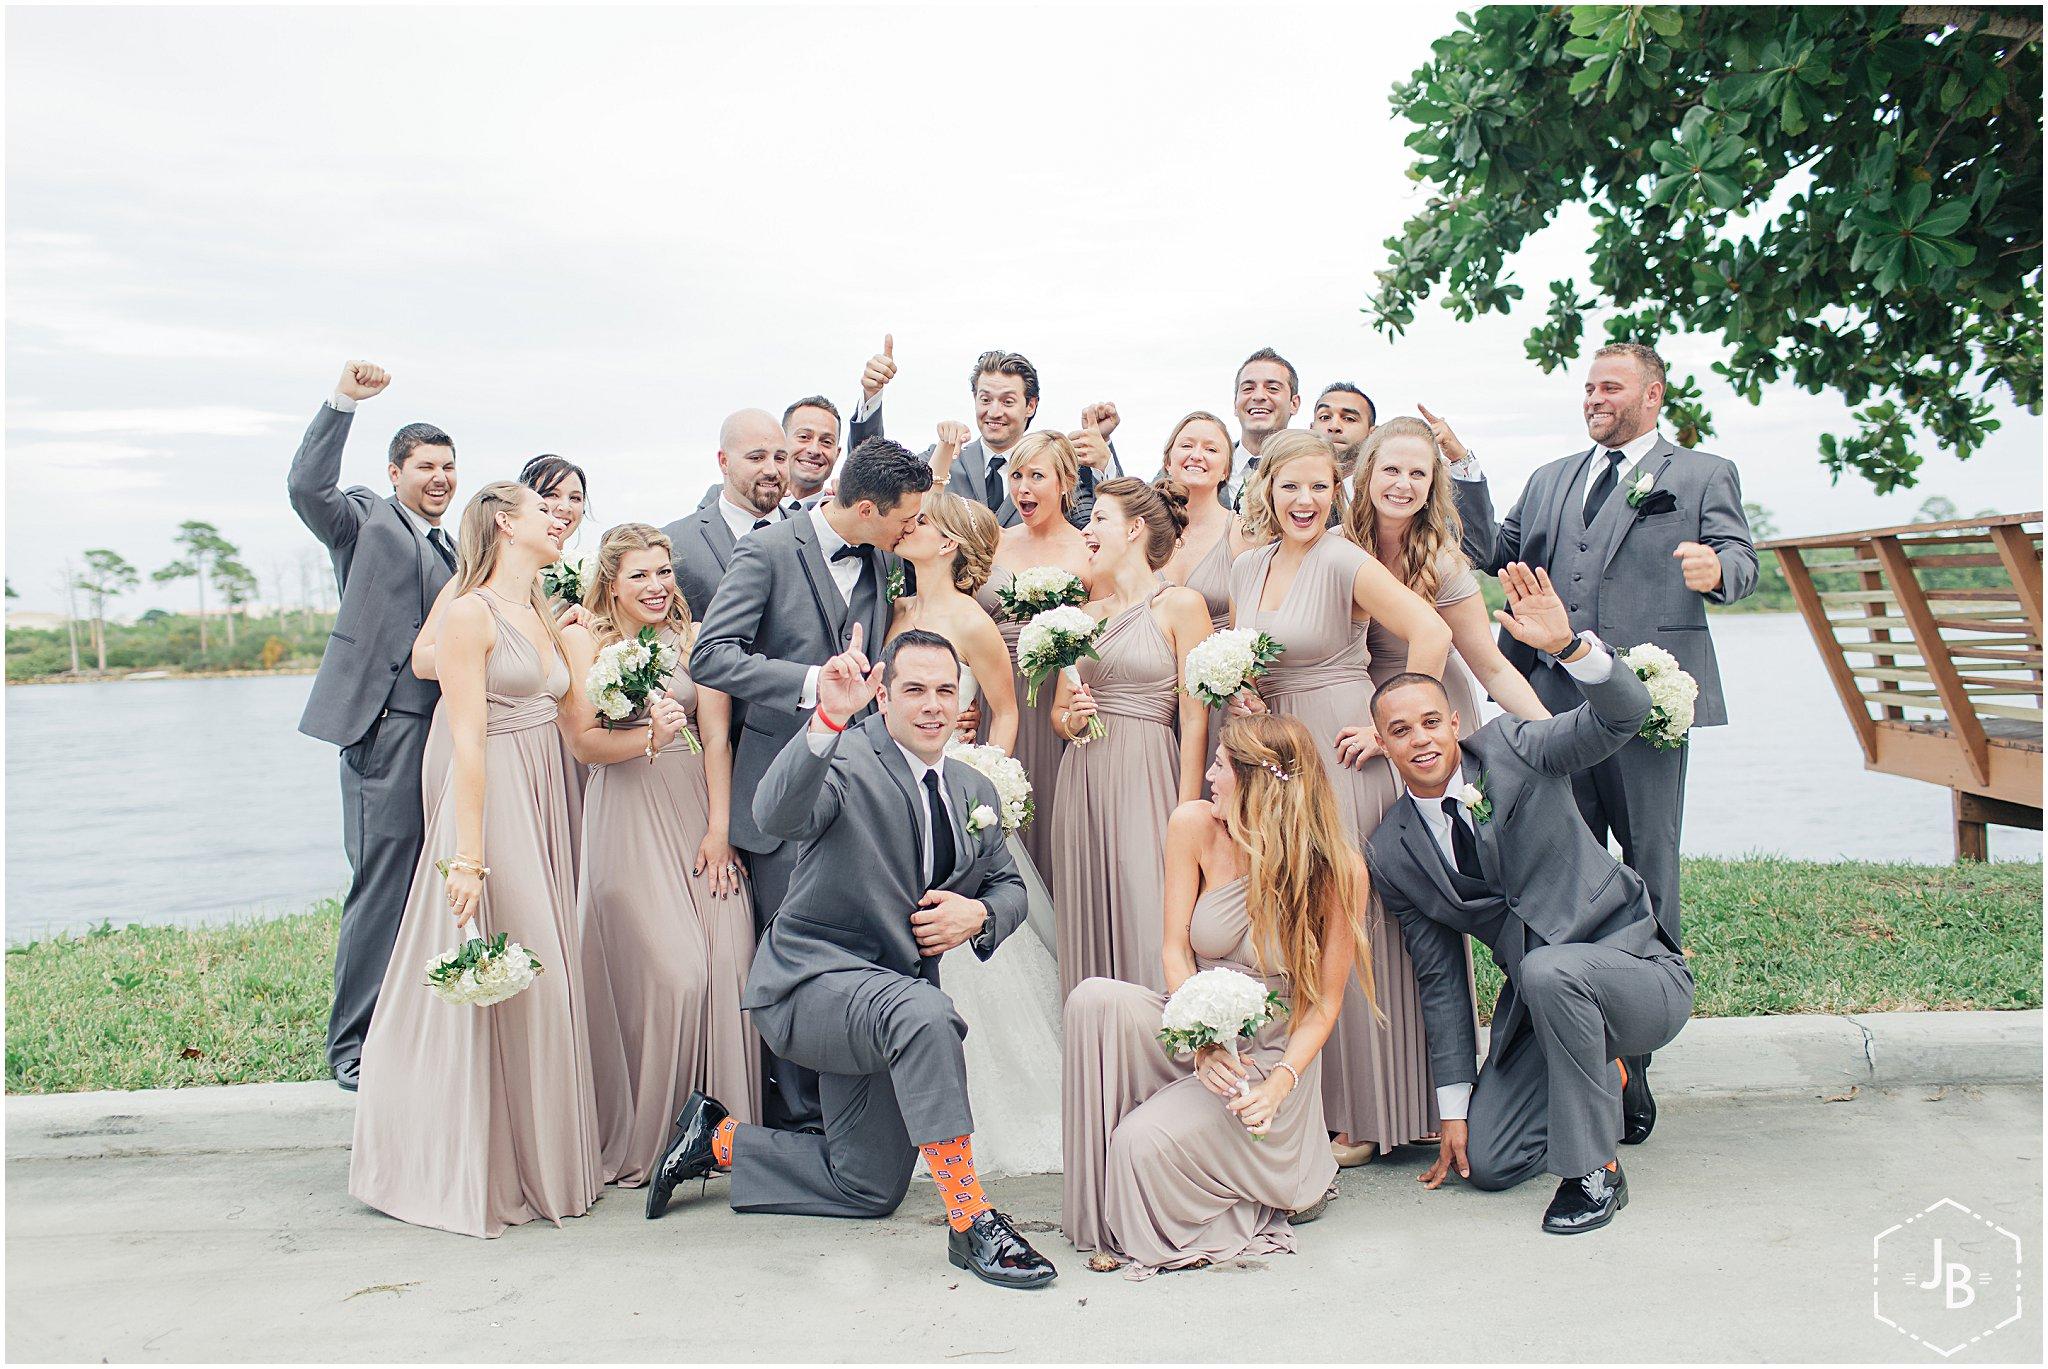 WeddingandEngagementFloridaPhotographer_0348.jpg